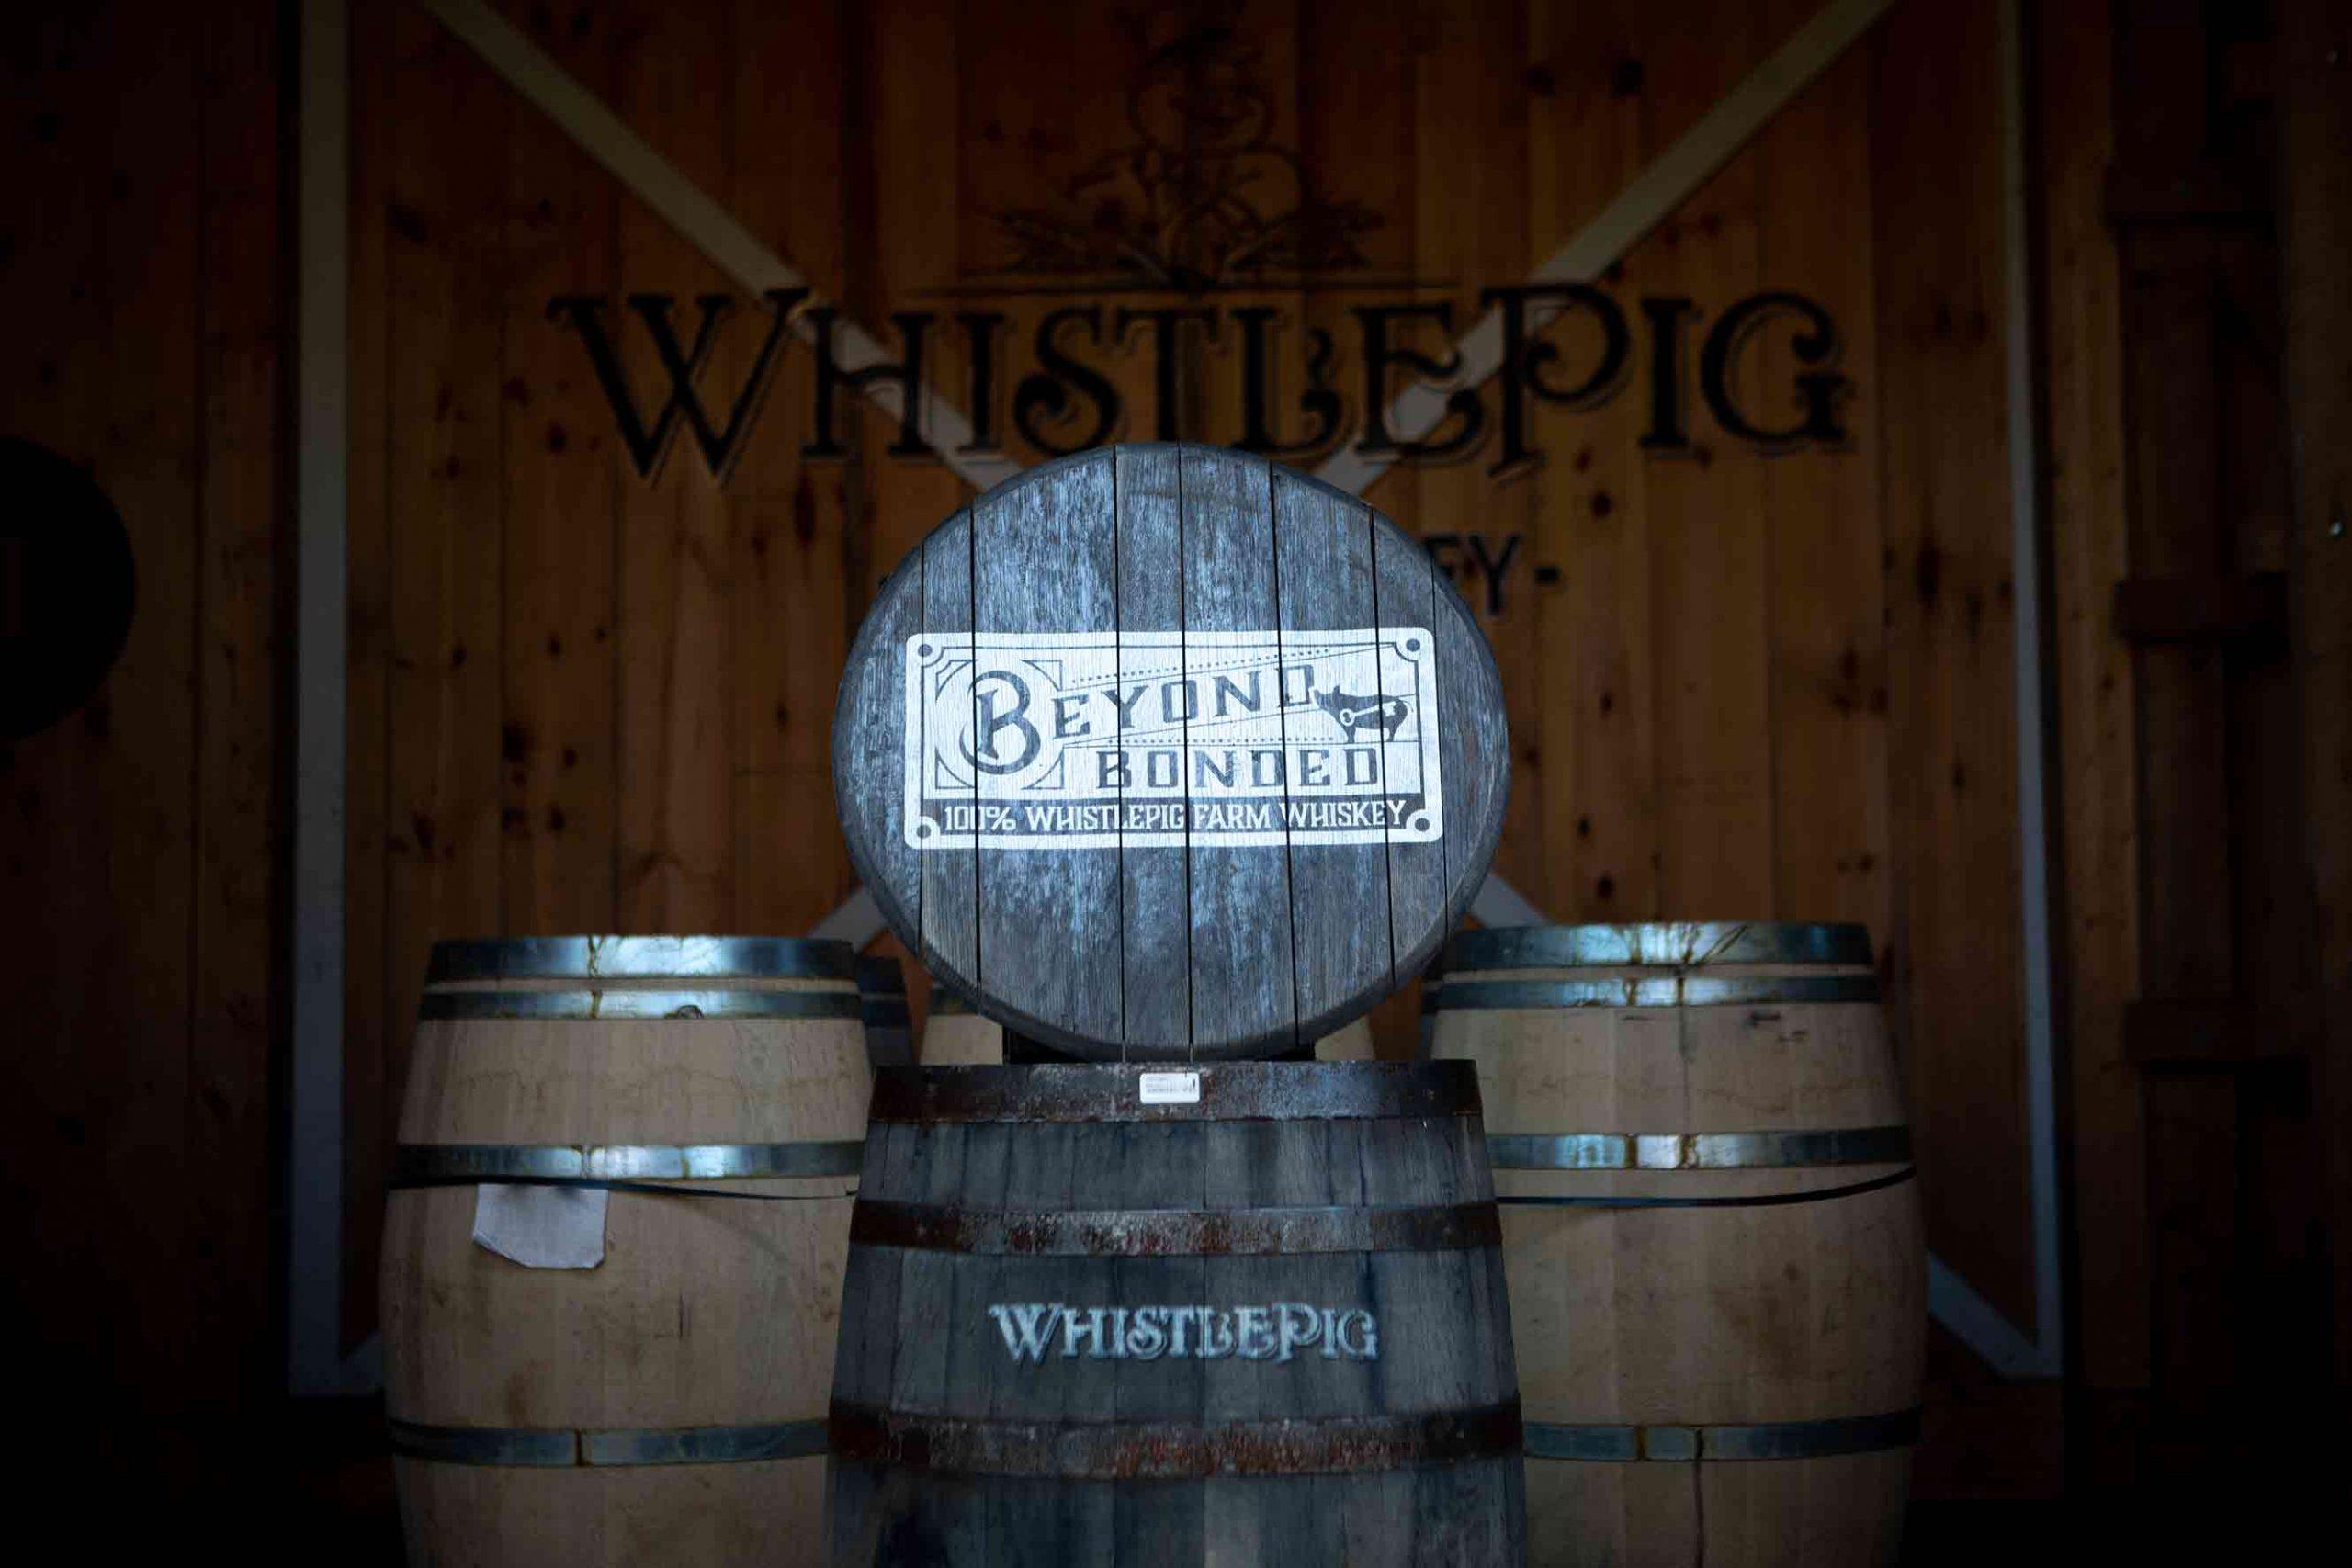 Lagavulin Offerman Edition Guinness: WhistlePig Whiskey FarmStock Beyond Bonded Barrel